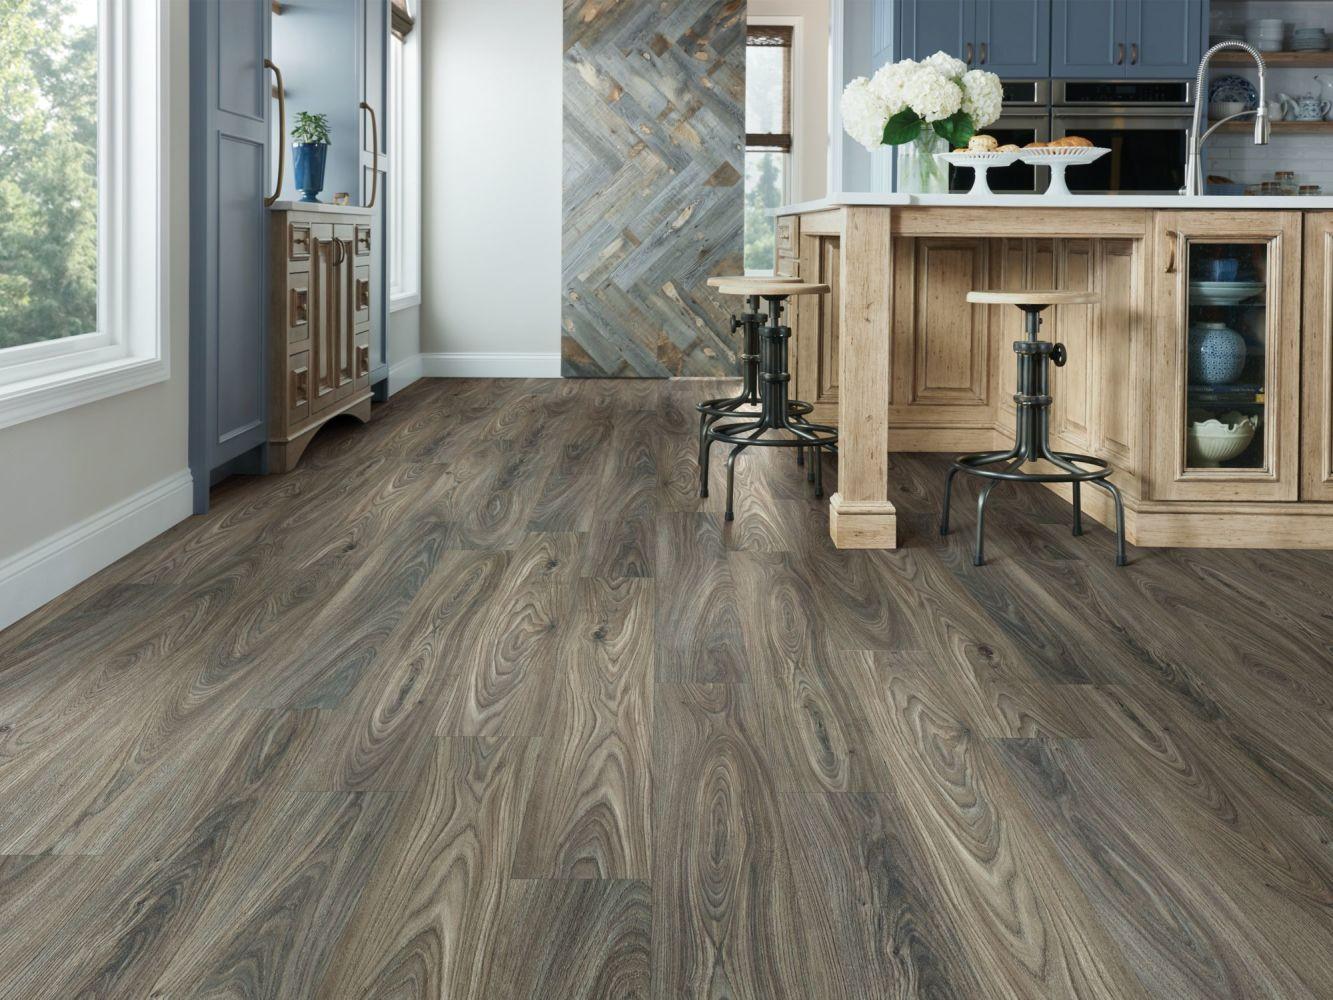 Shaw Floors Travera Plus 20 Dark Elm 00915_FR622